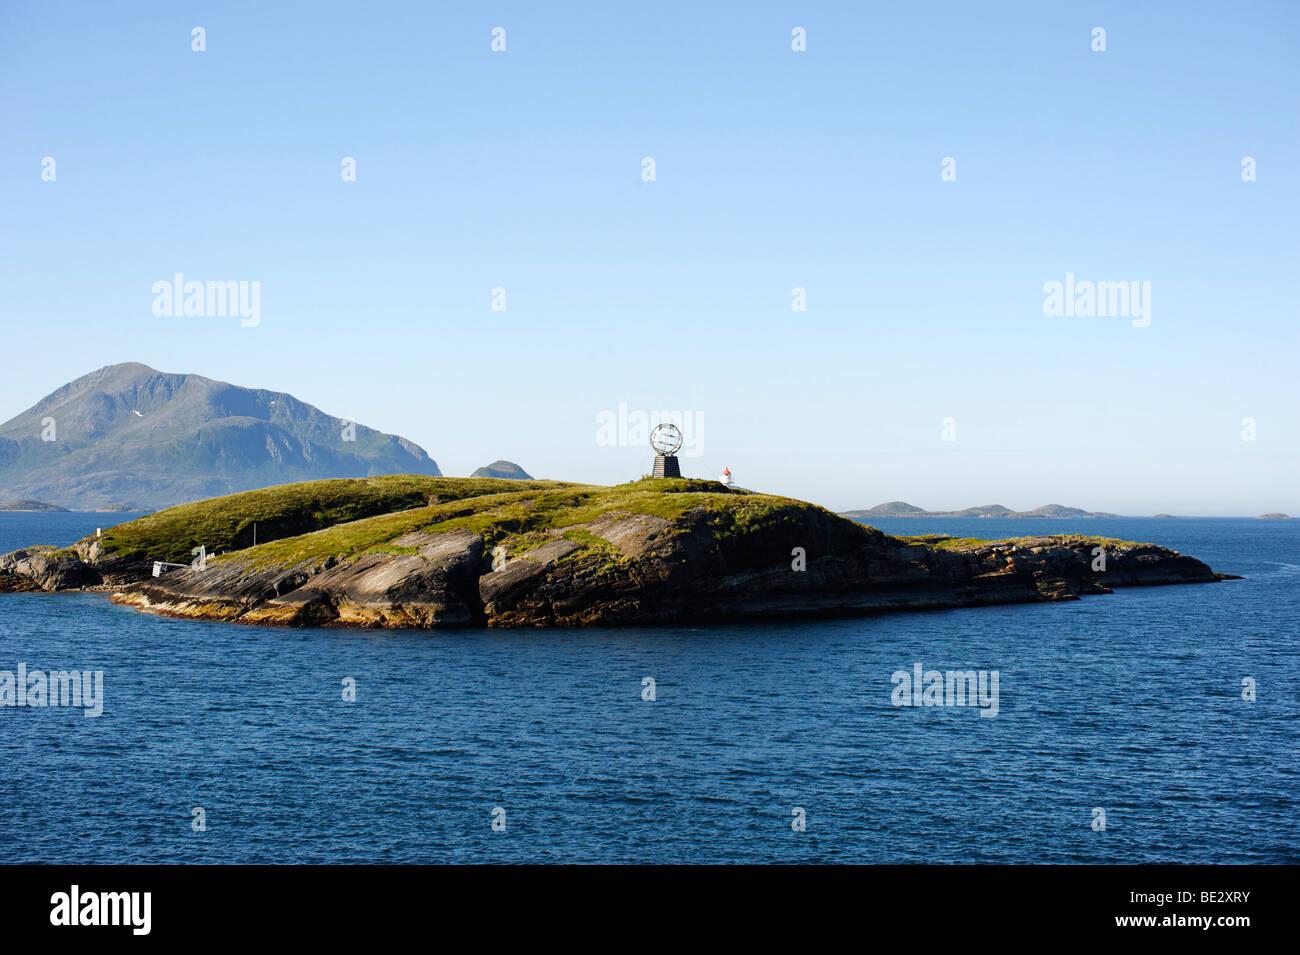 Landmark polar circle, Norwegian Sea, Norway, Scandinavia, Europe - Stock Image